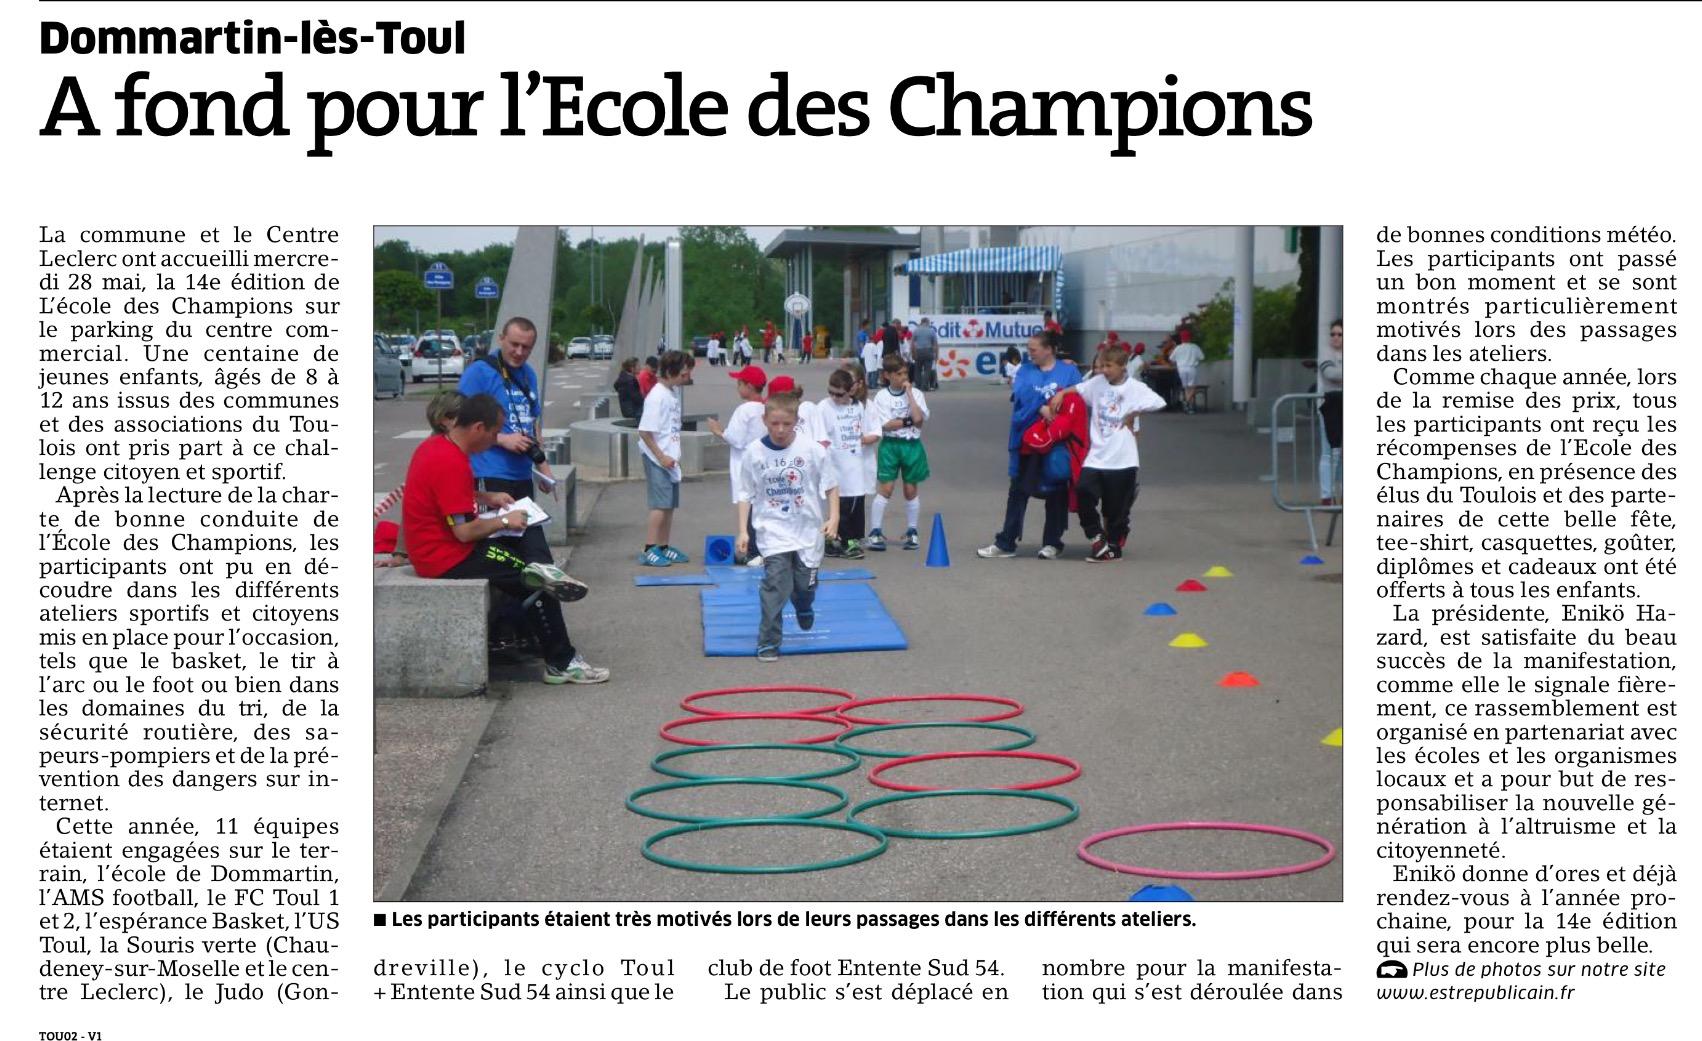 27 mai 2015 - Dommartin-les-Toul